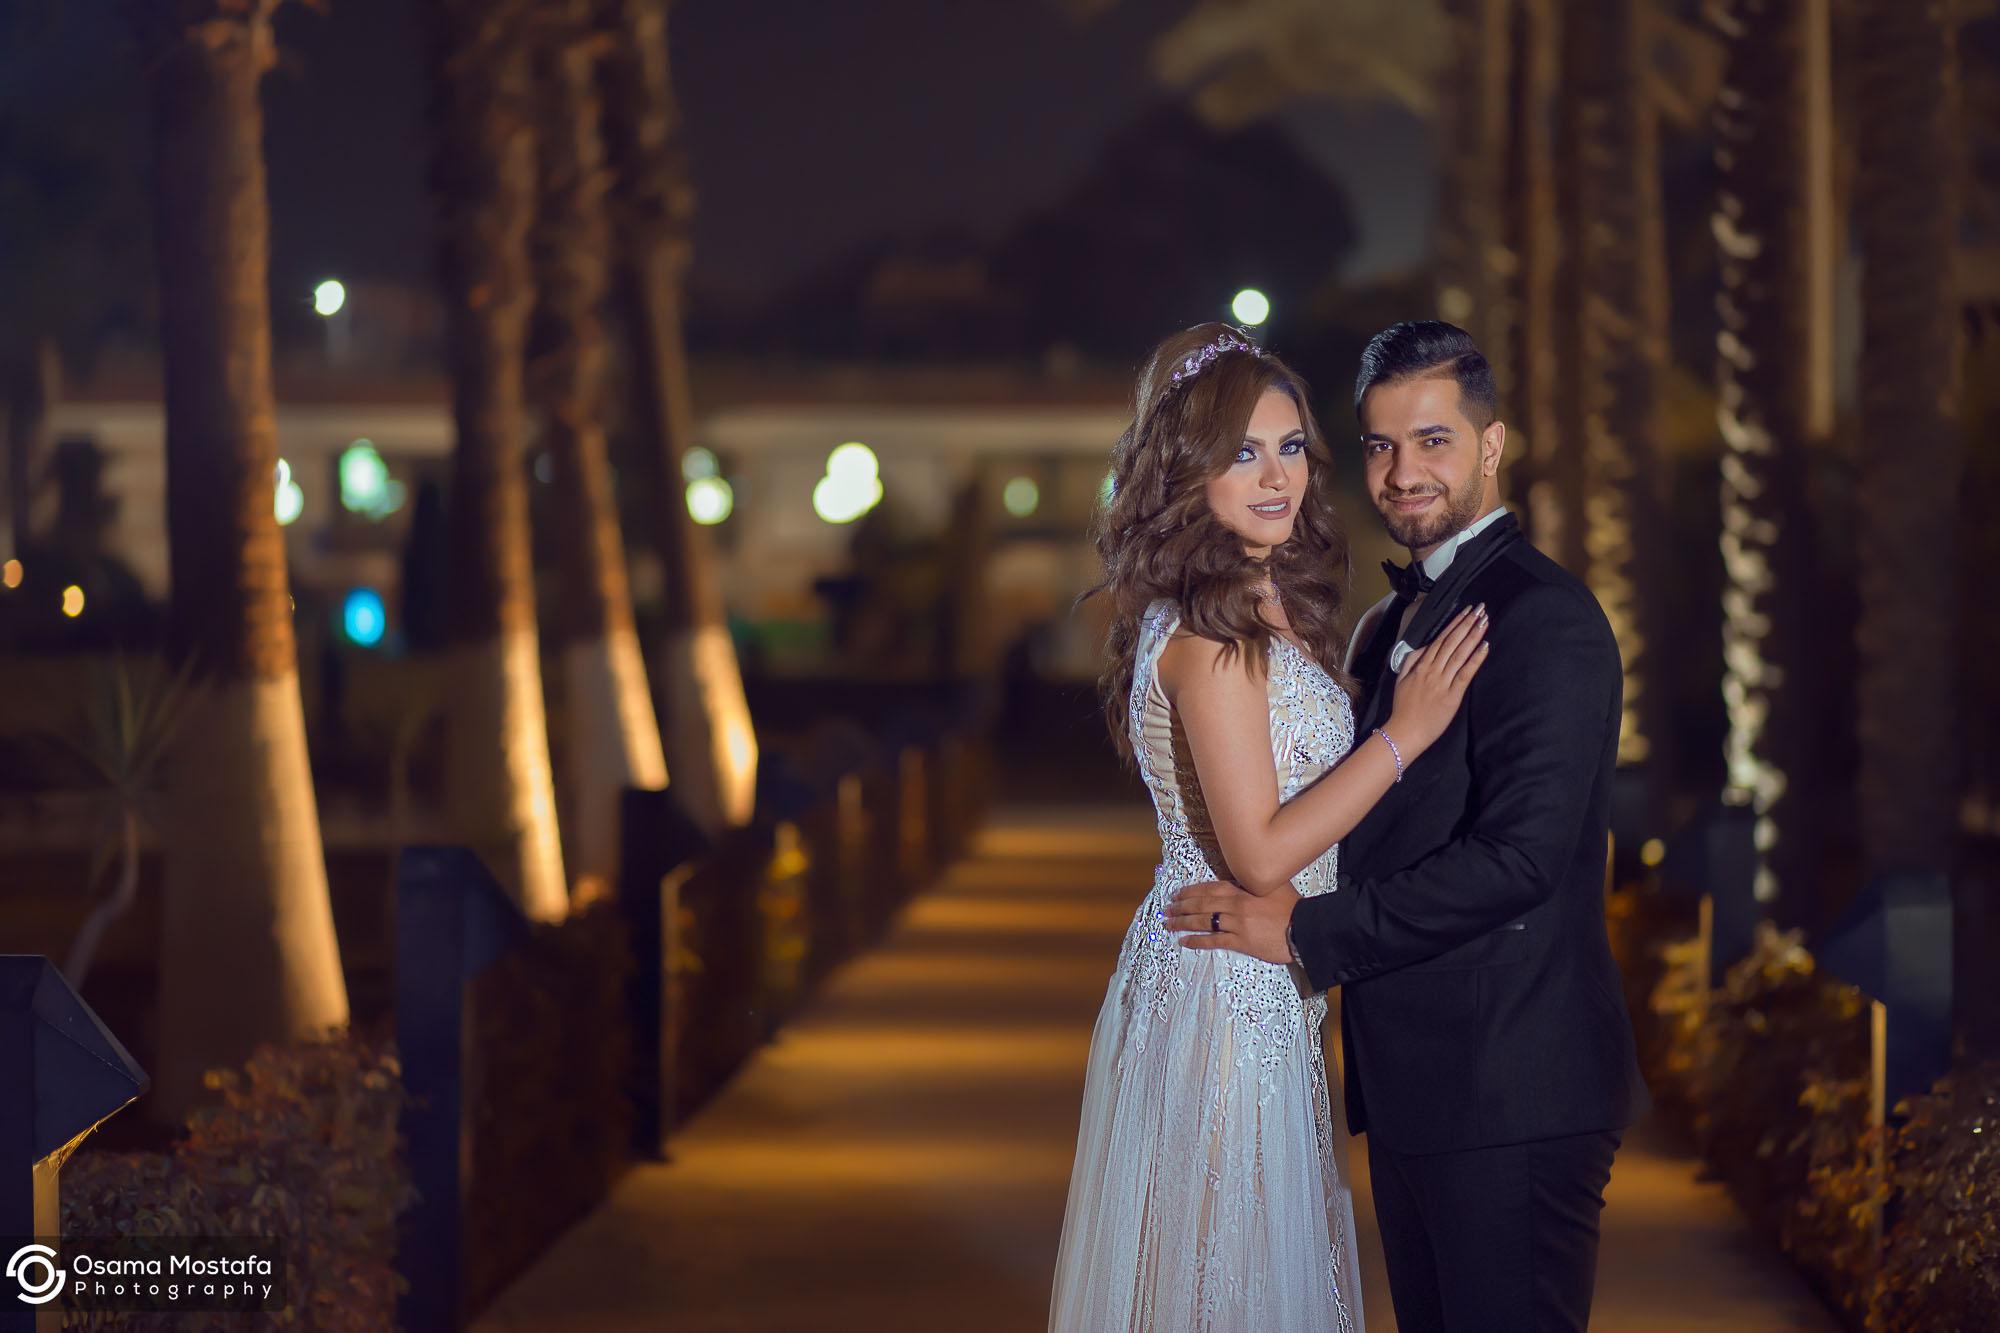 Omar & Habiba